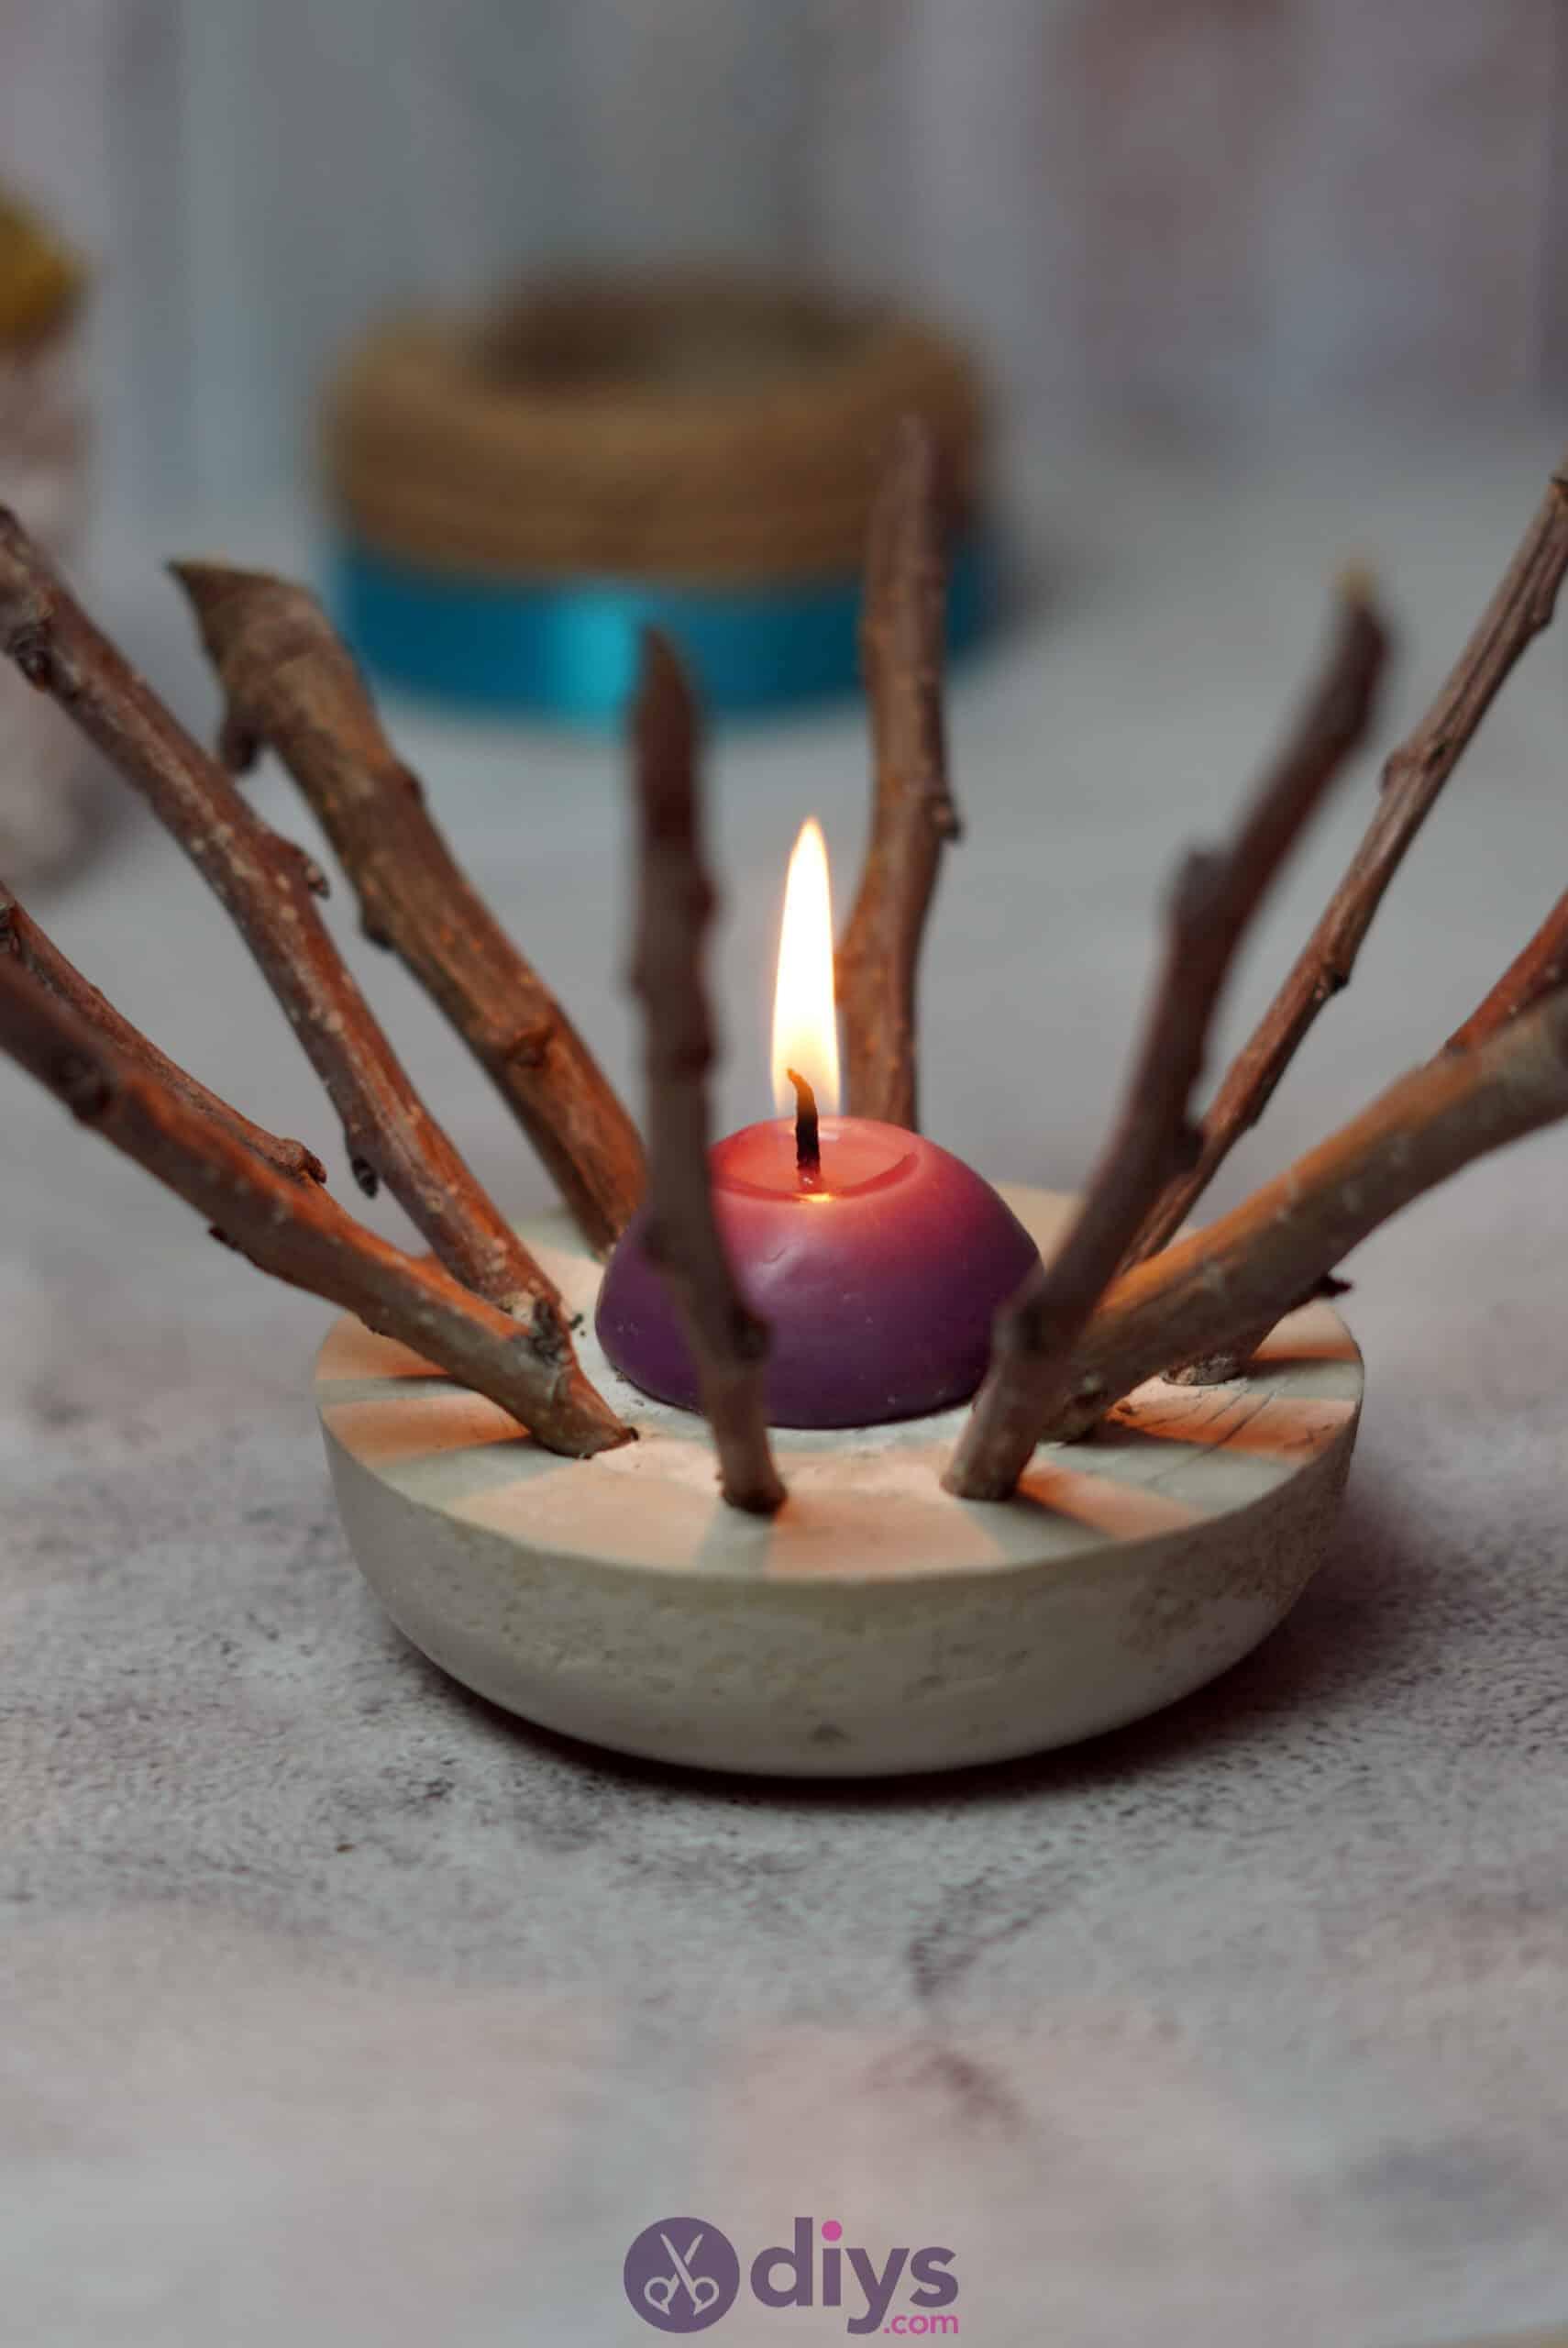 Diy wood concrete candle art step 6g